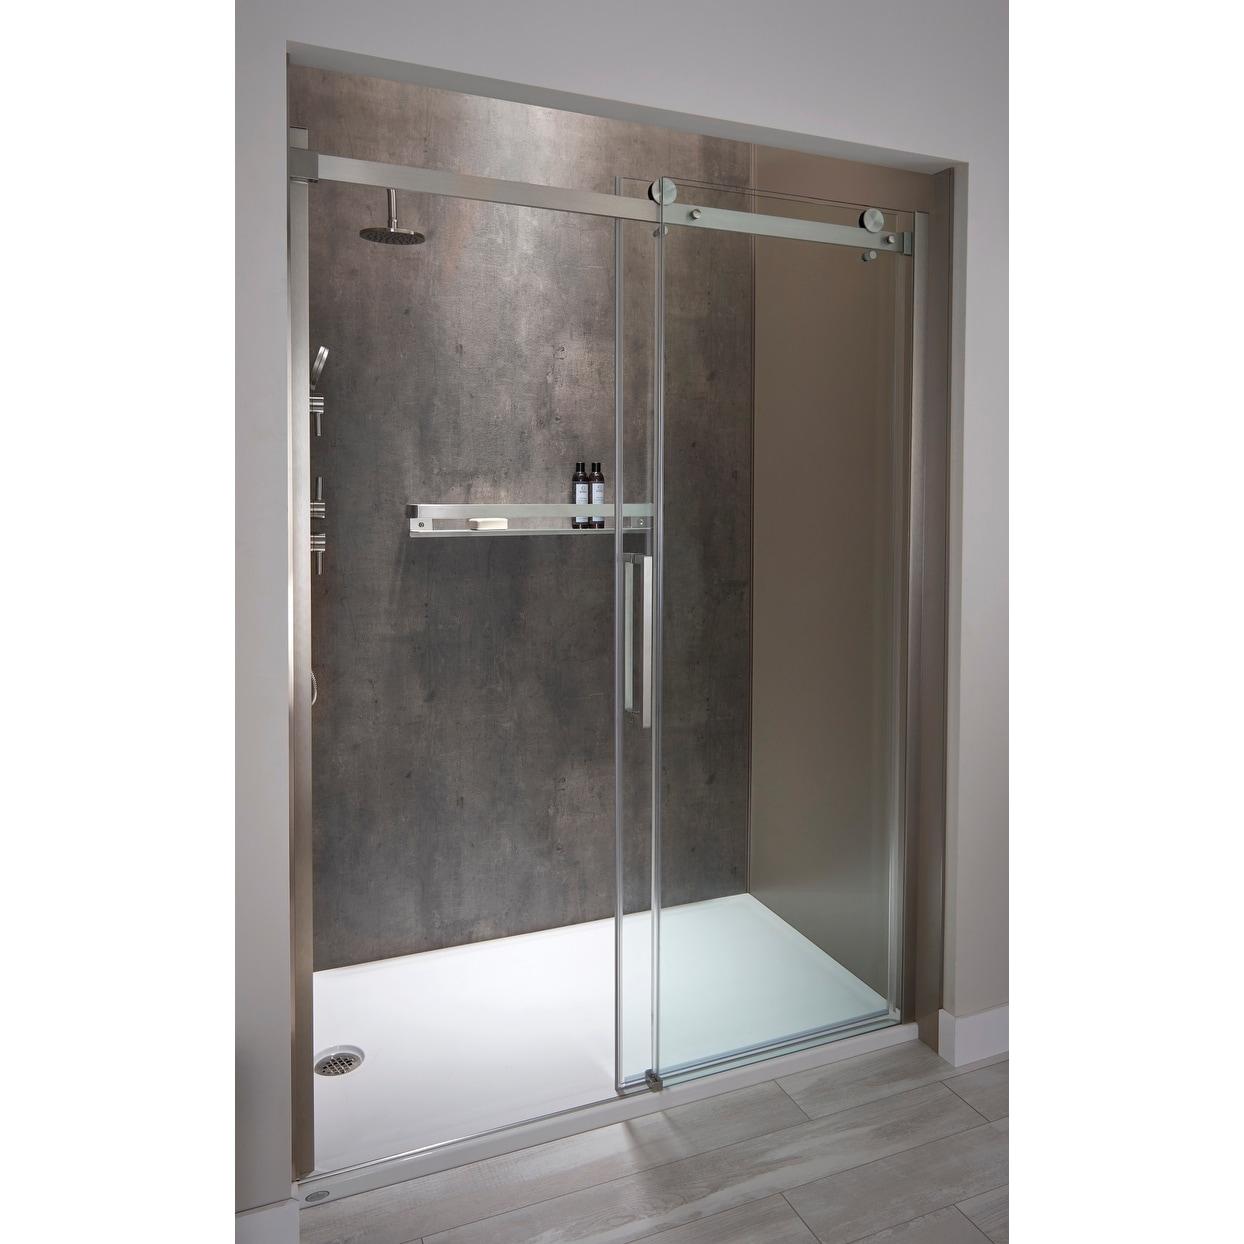 Buy Brushed Nickel Shower Doors Online At Overstock Our